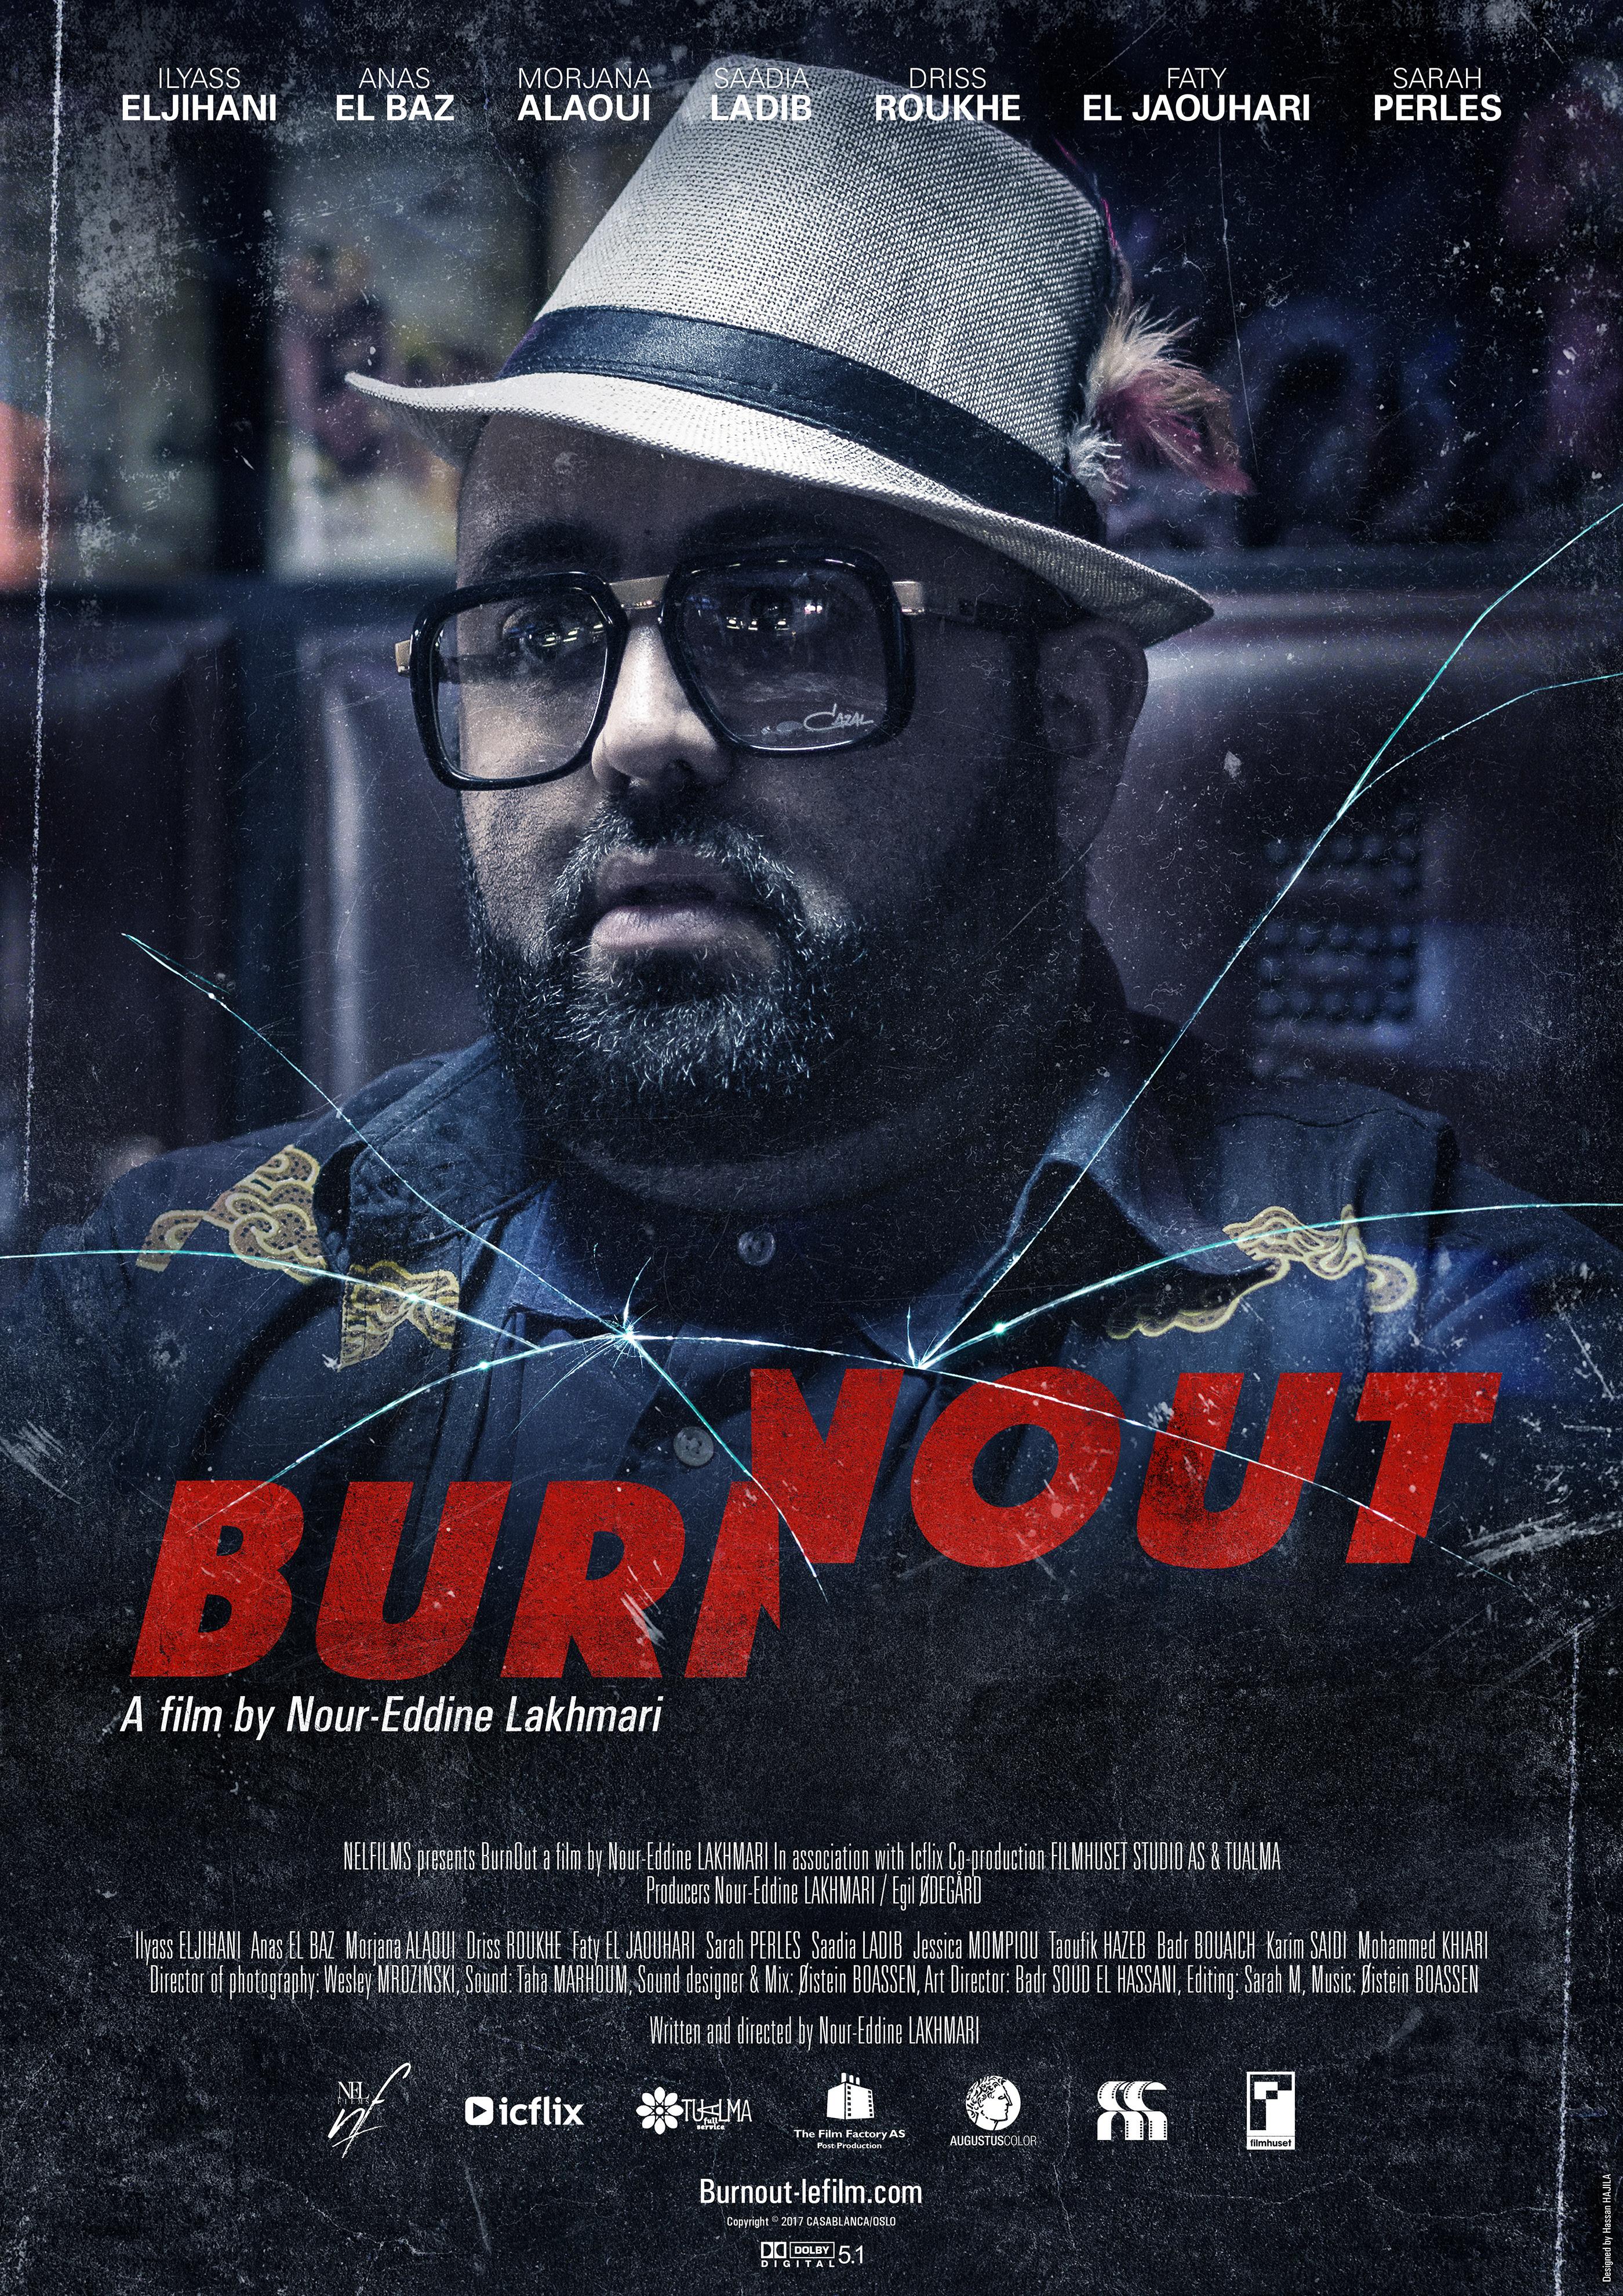 burnout film